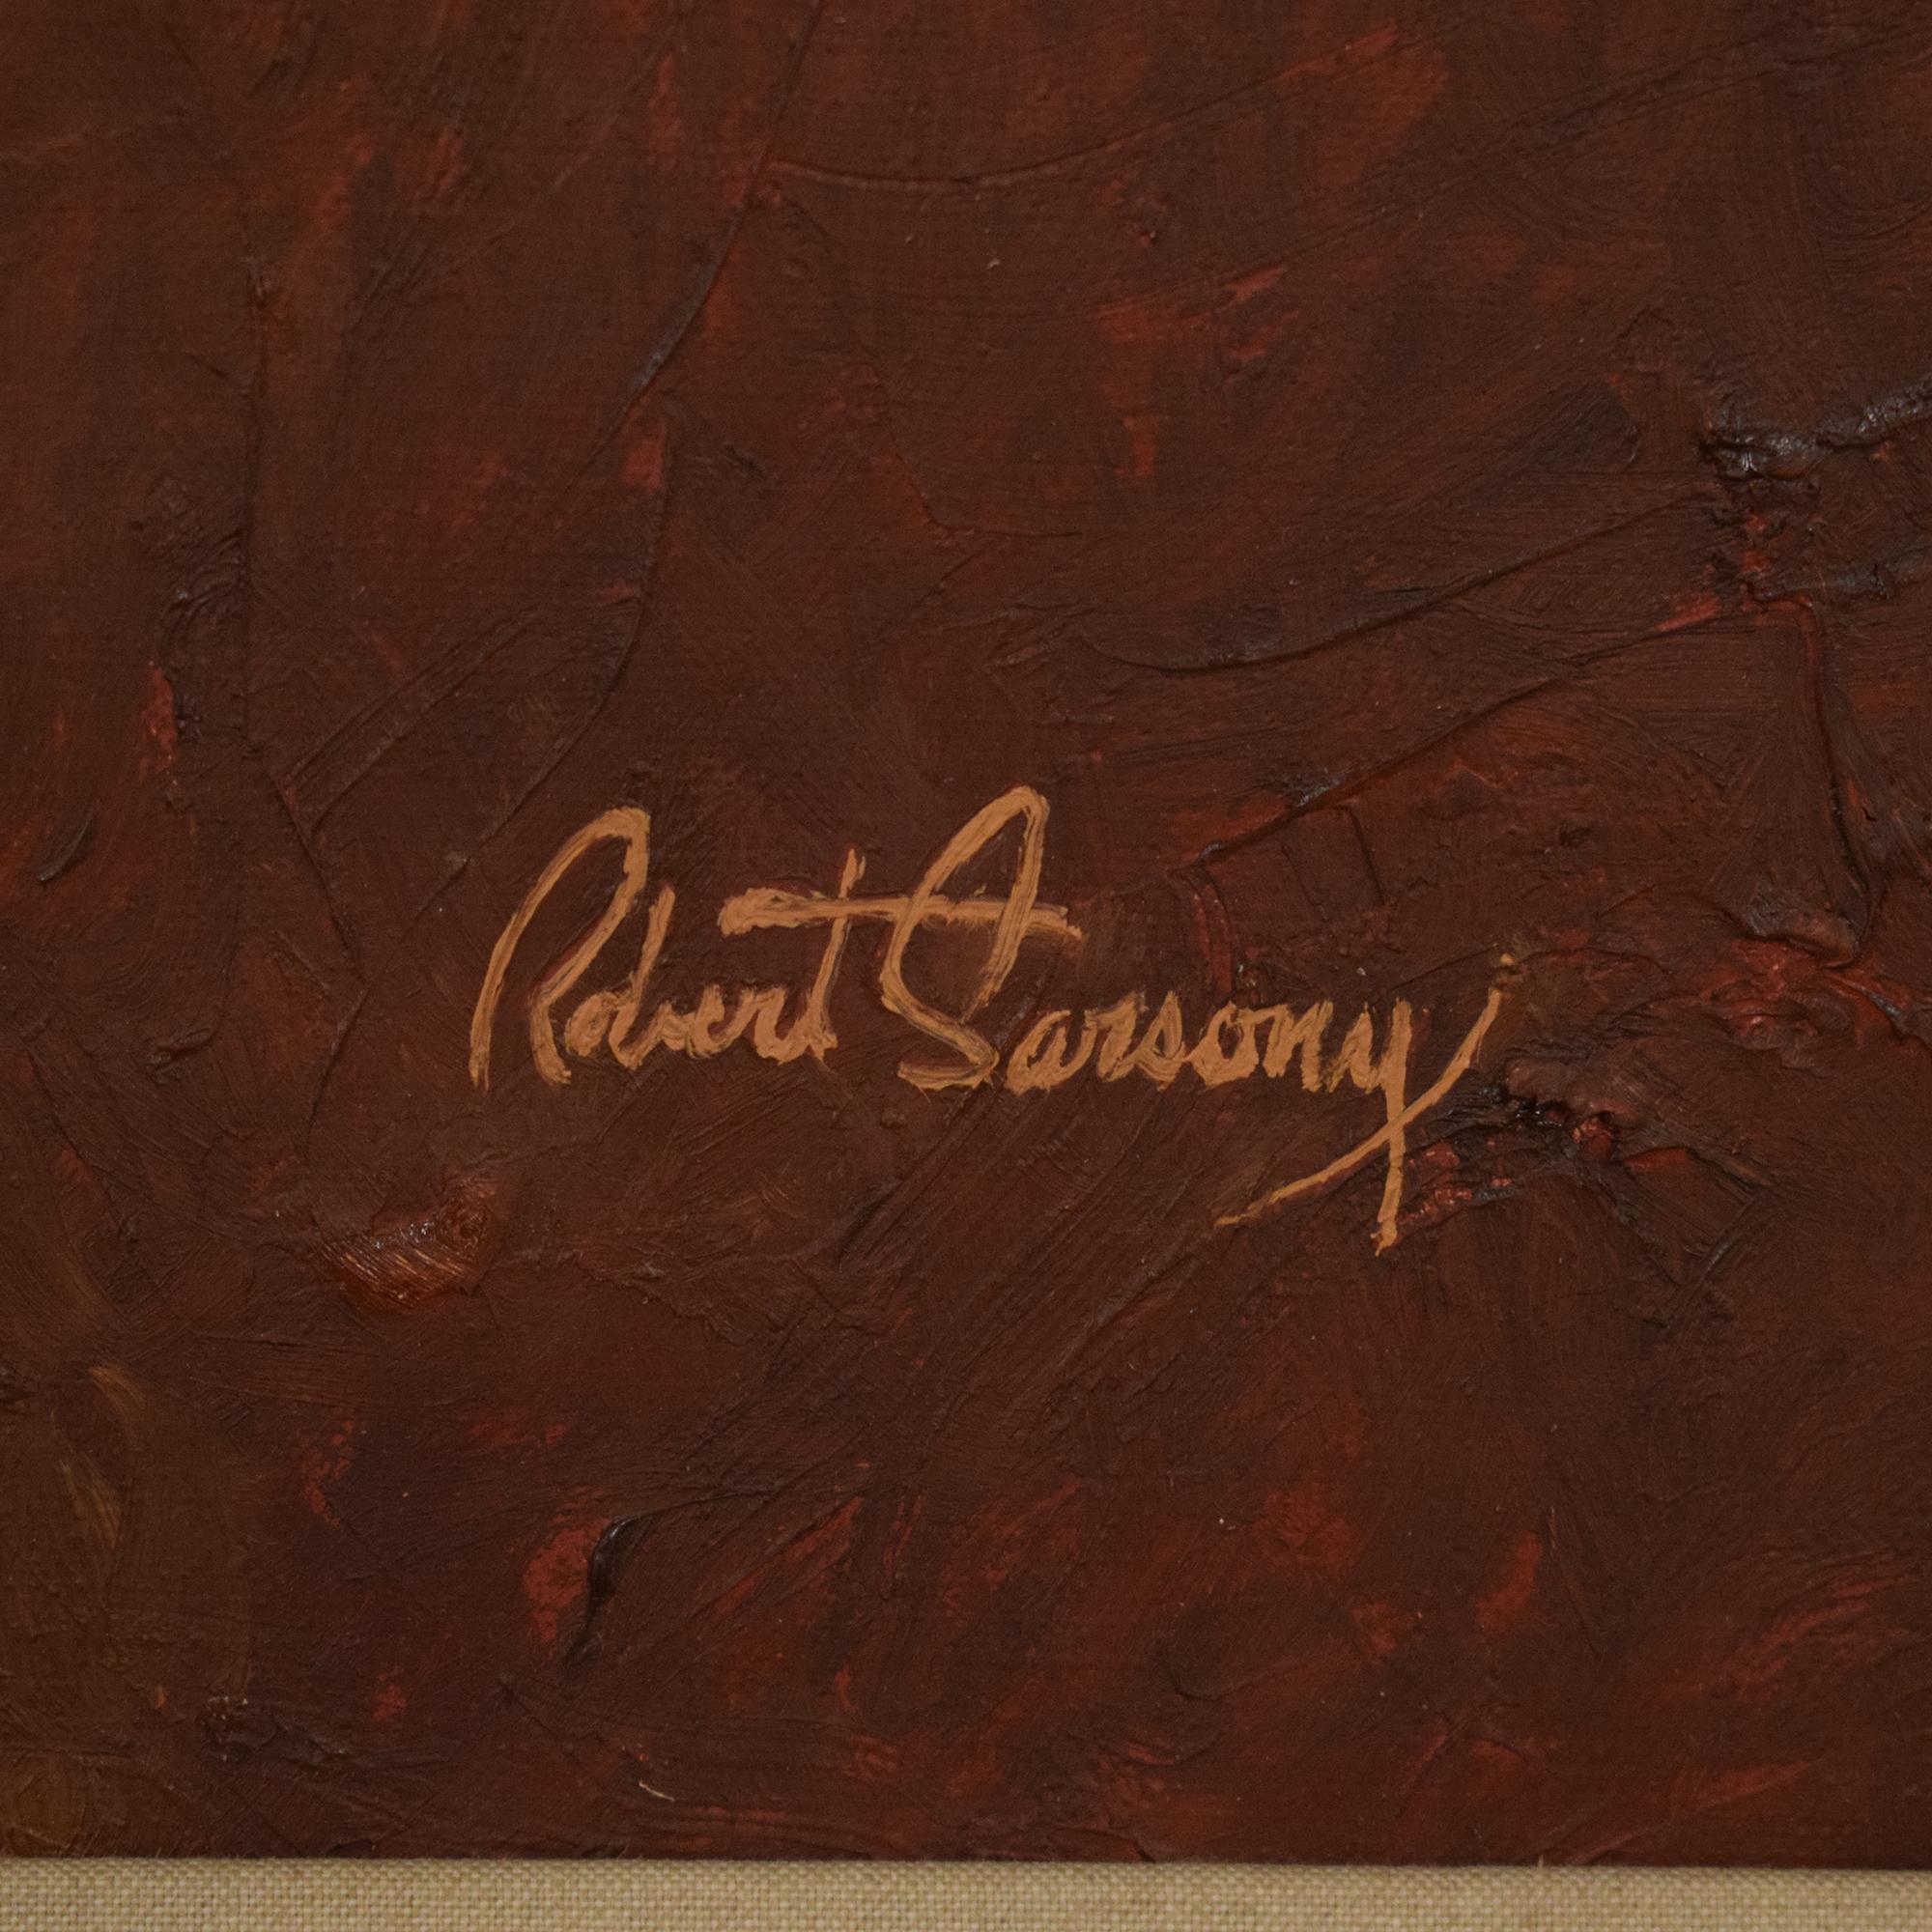 Robert Sarsony The New Toy Framed Wall Art ma